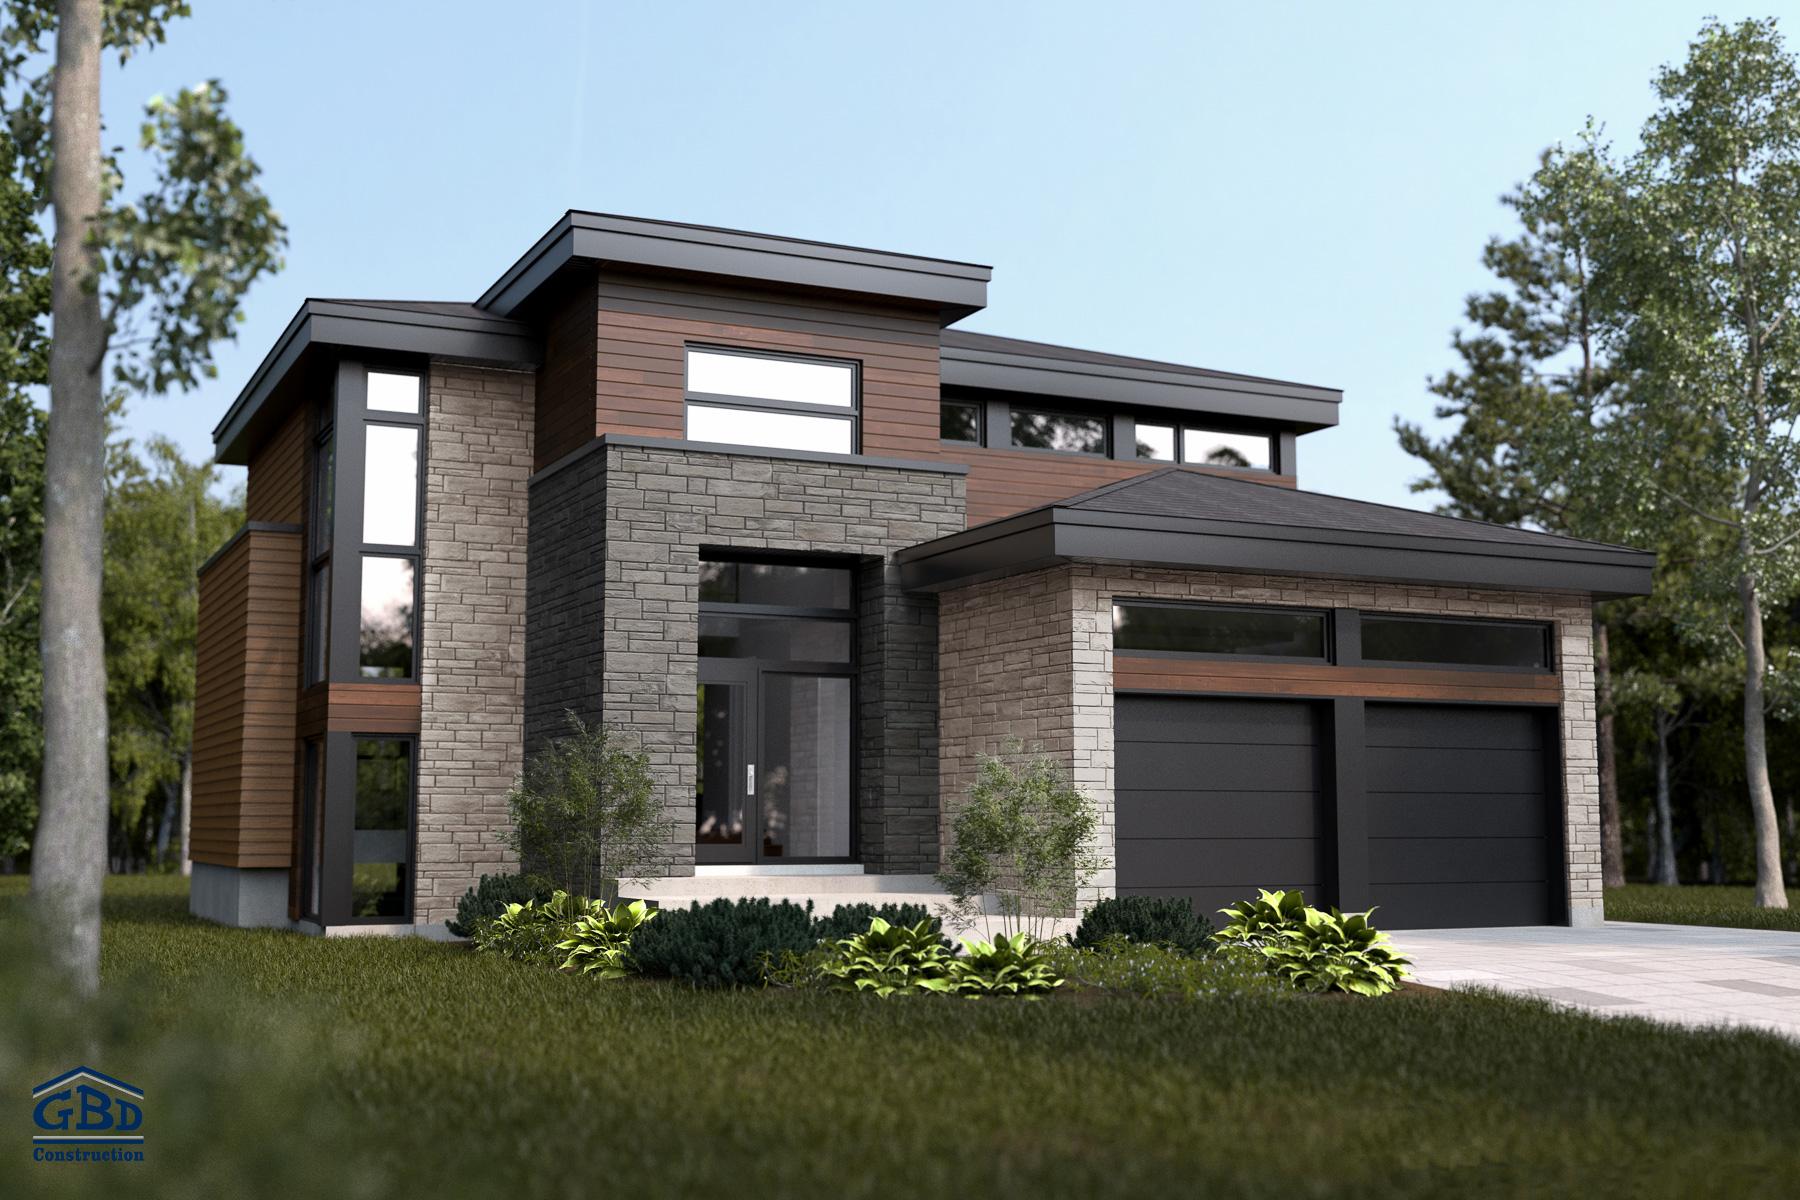 maison moderne 2 etages